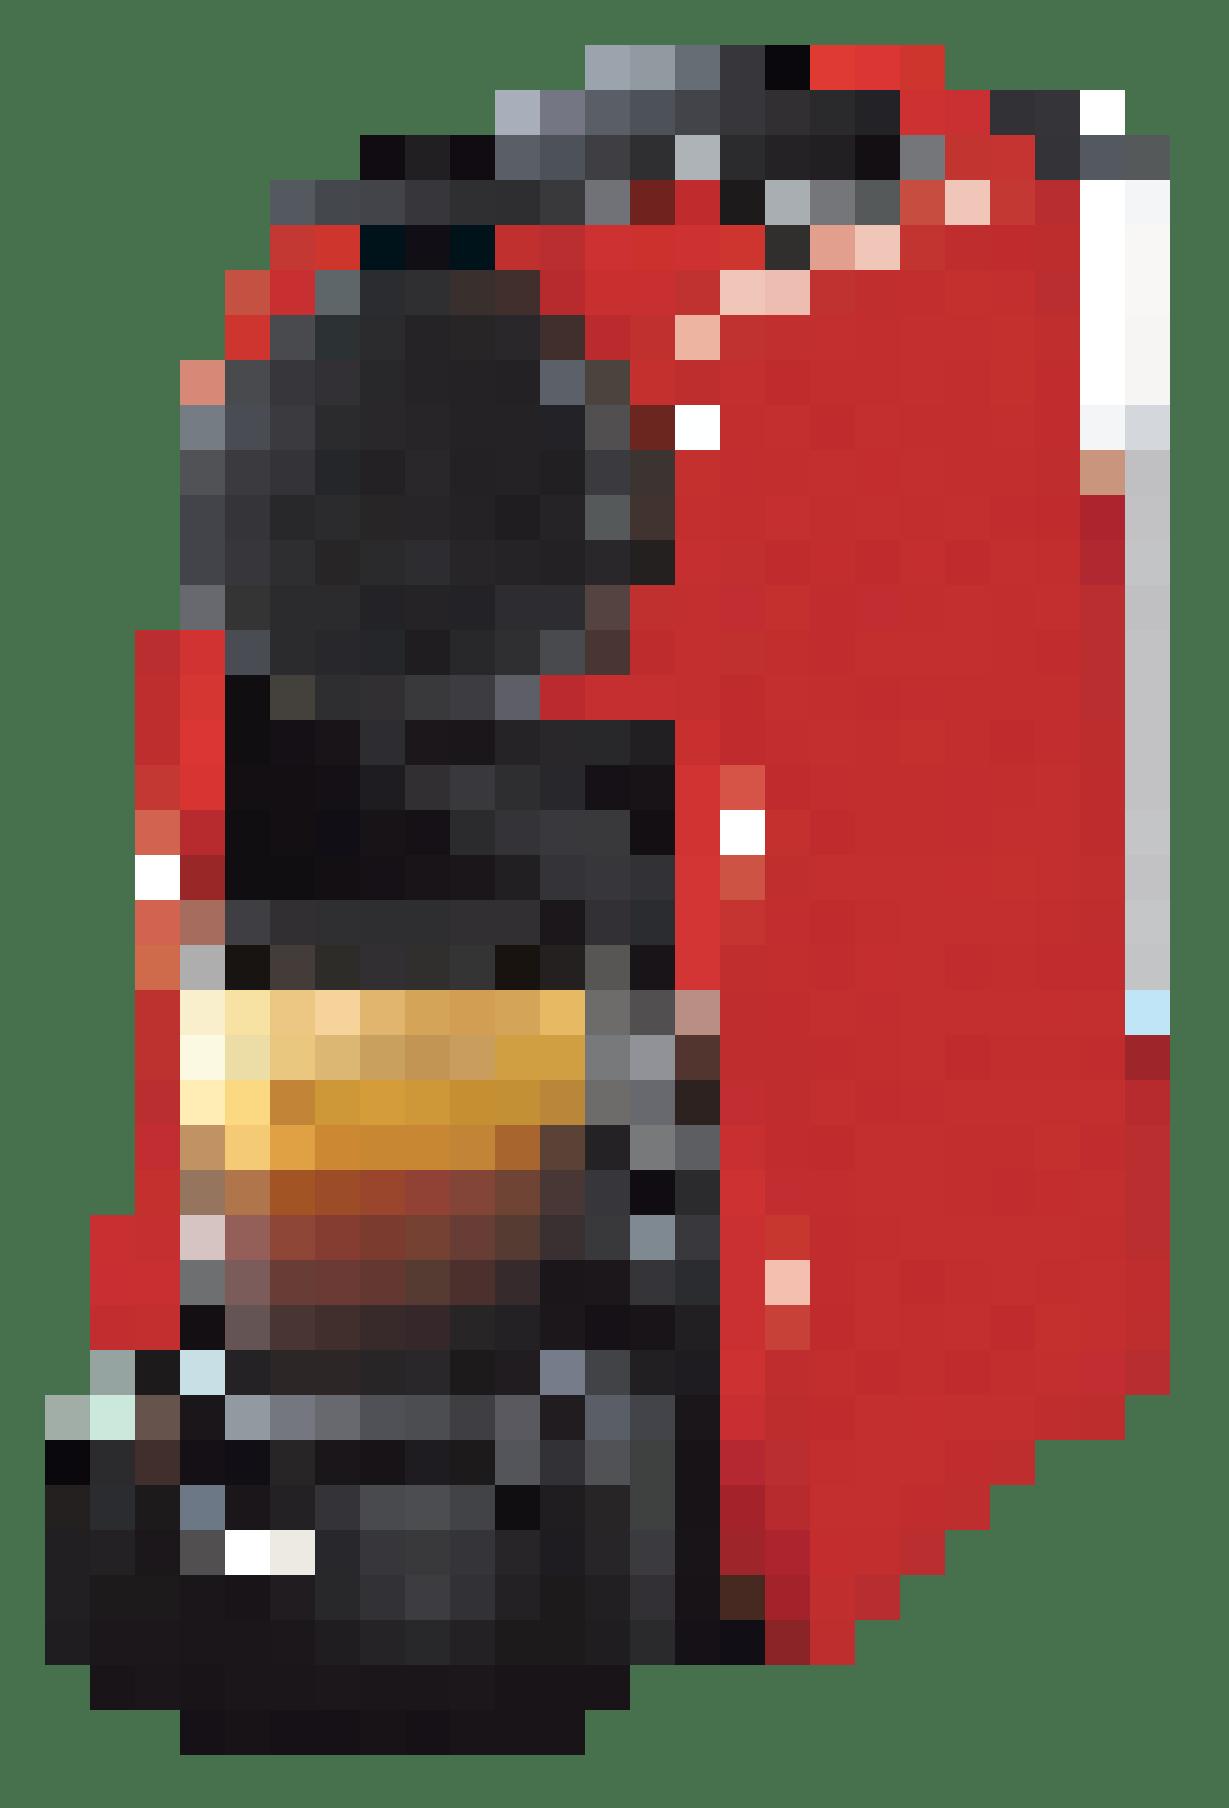 Nespressomaschine Delonghi Mini, Fr. 89.90, bei Fust.